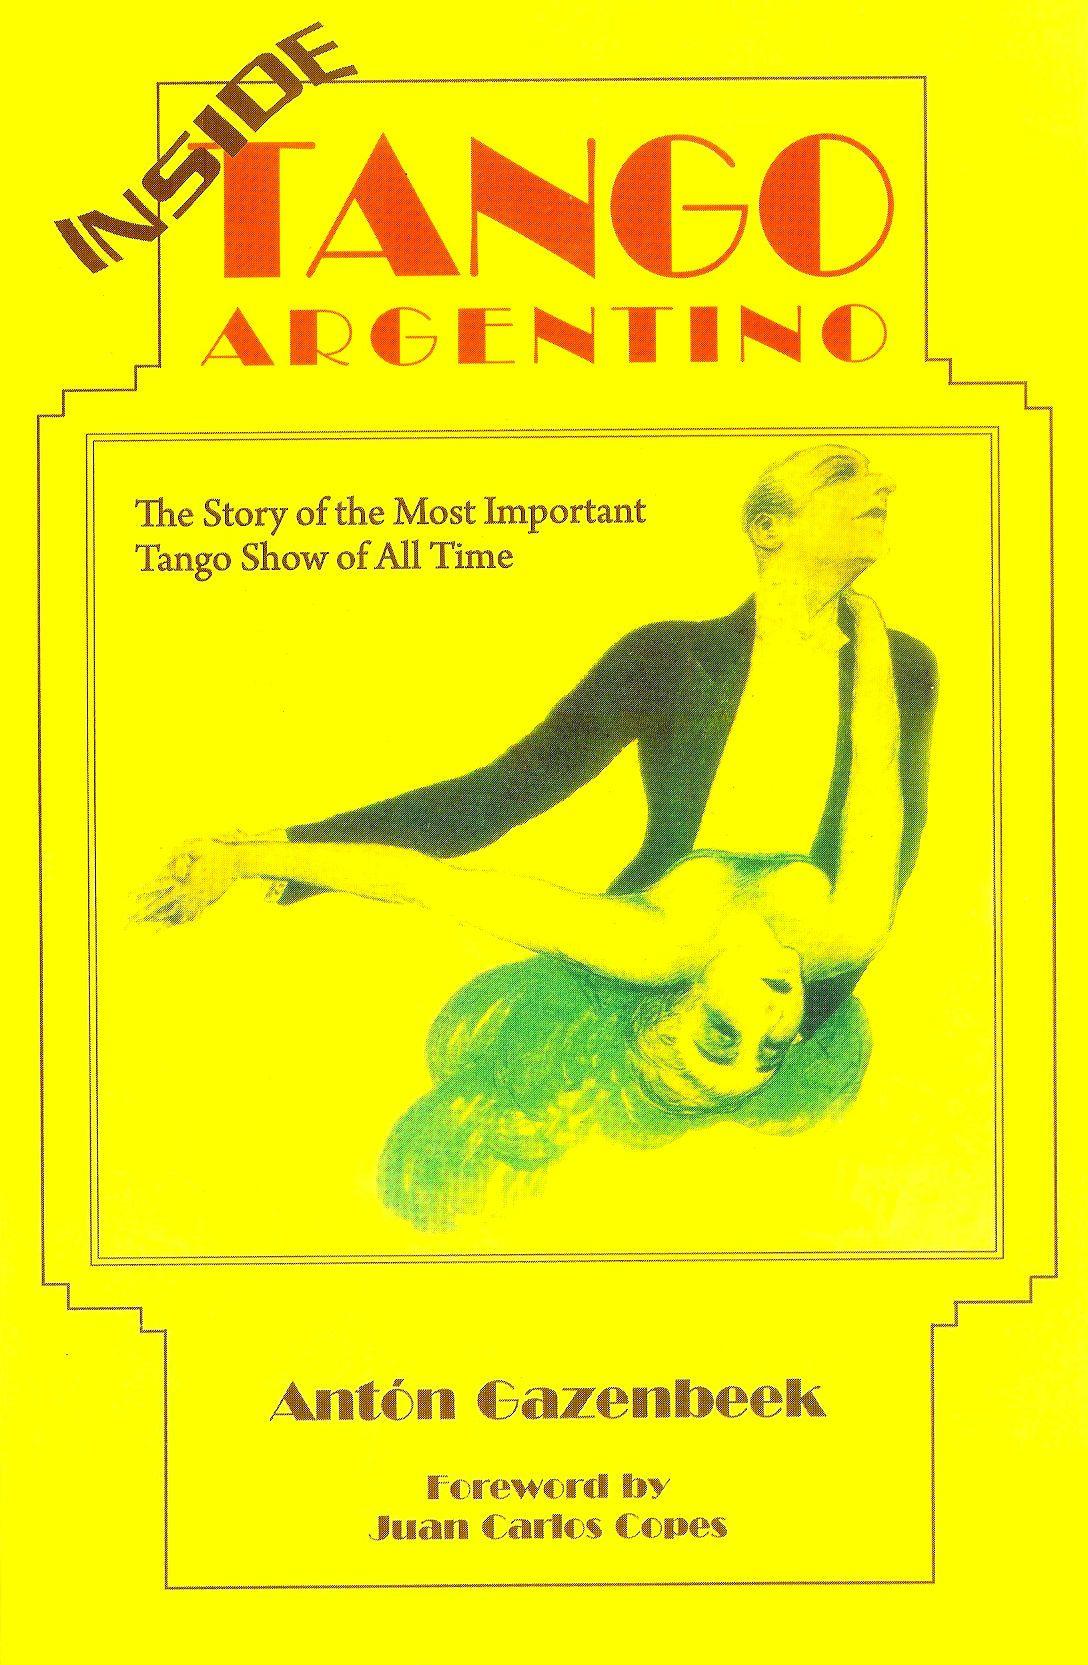 Inside Tango Argentino. - epub